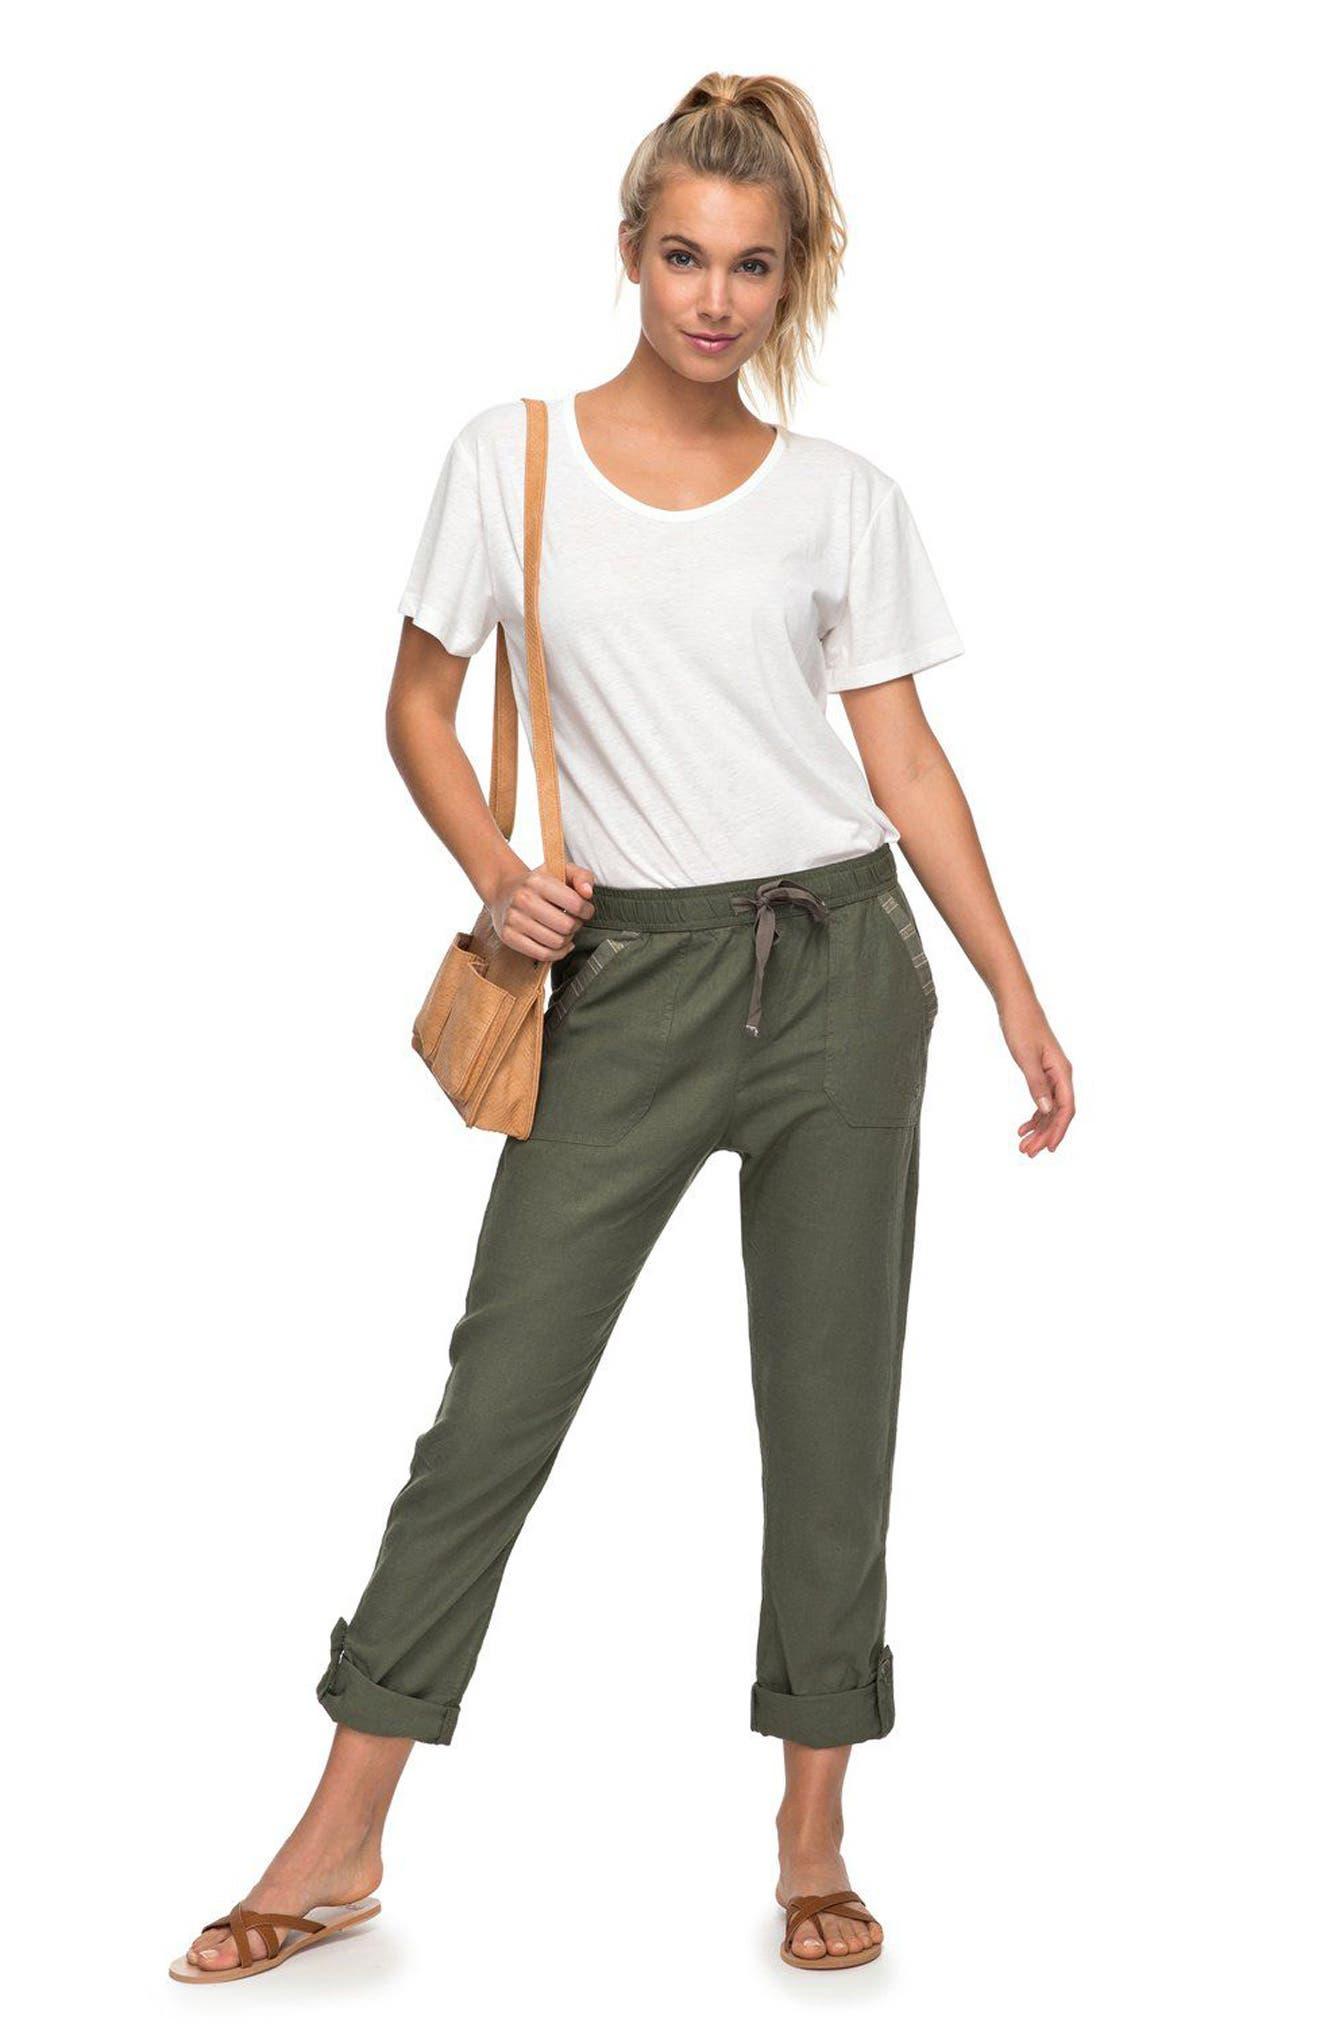 Symphony Lover Linen Blend Pants,                             Alternate thumbnail 2, color,                             Dusty Olive